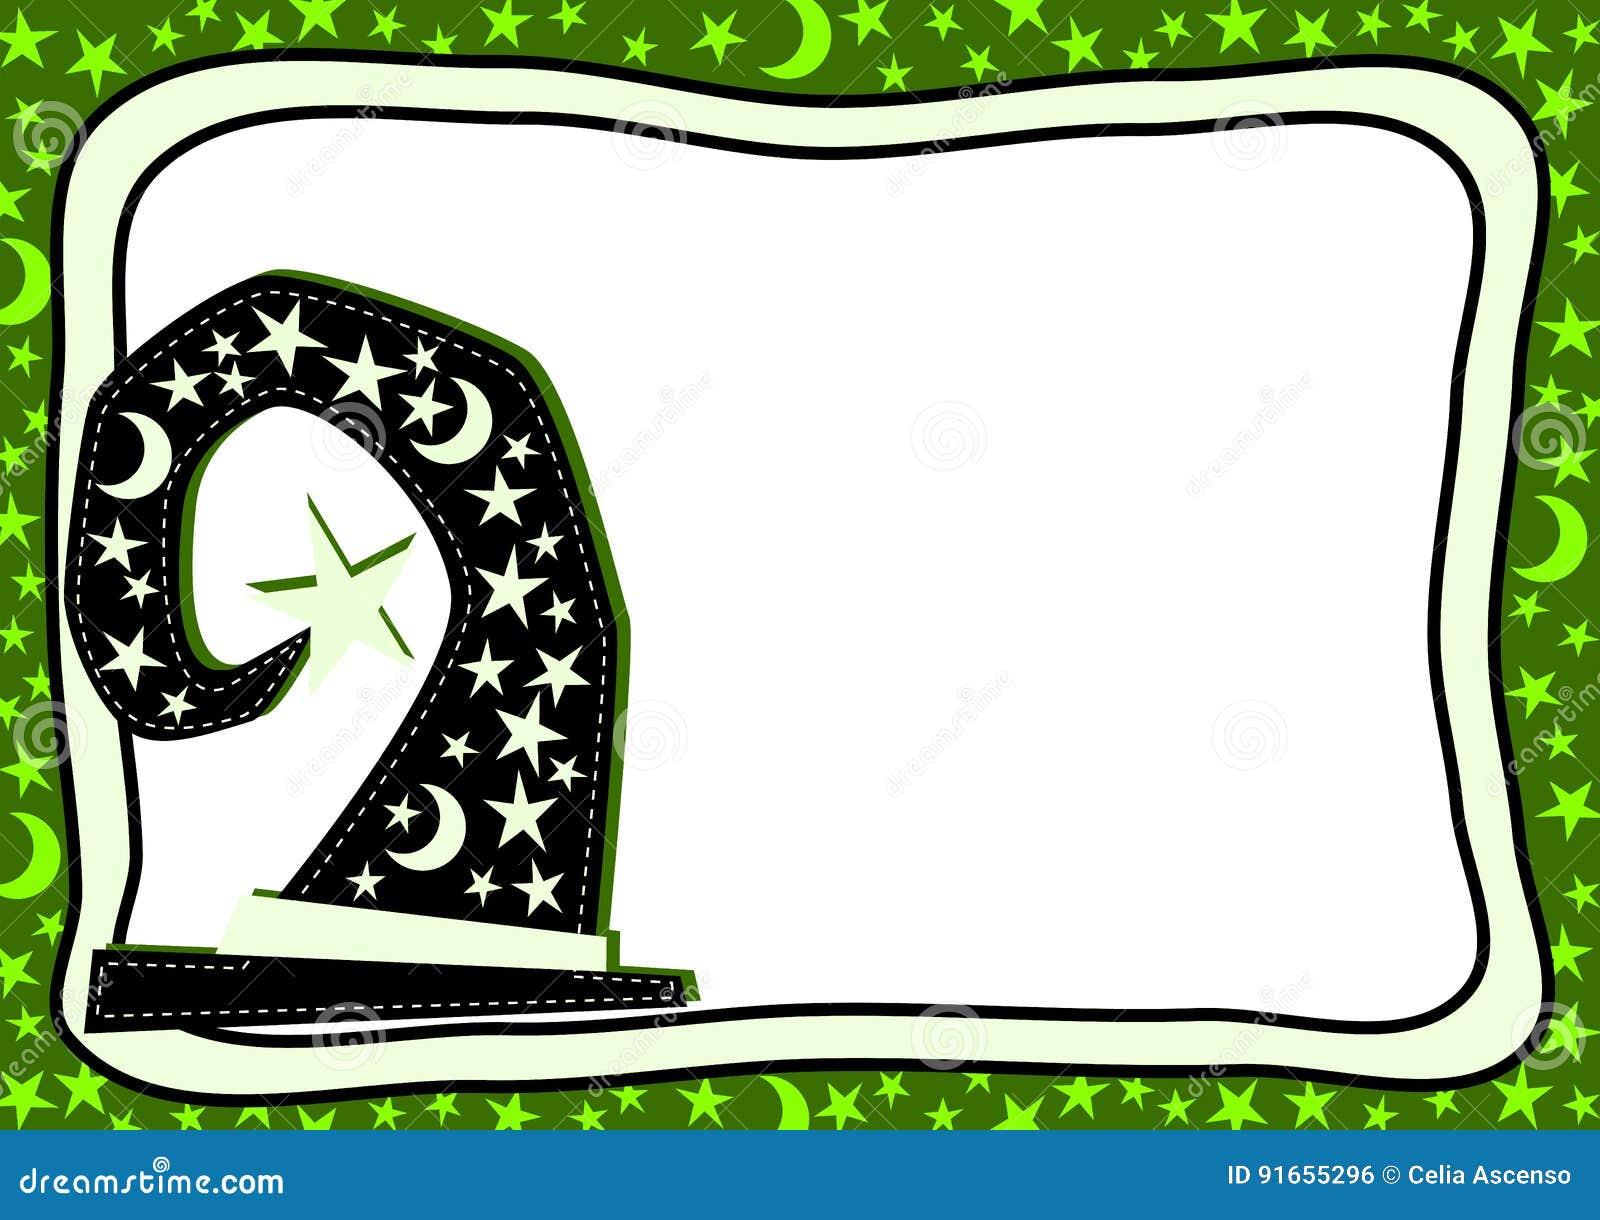 halloween party invitation card stock illustration - illustration of